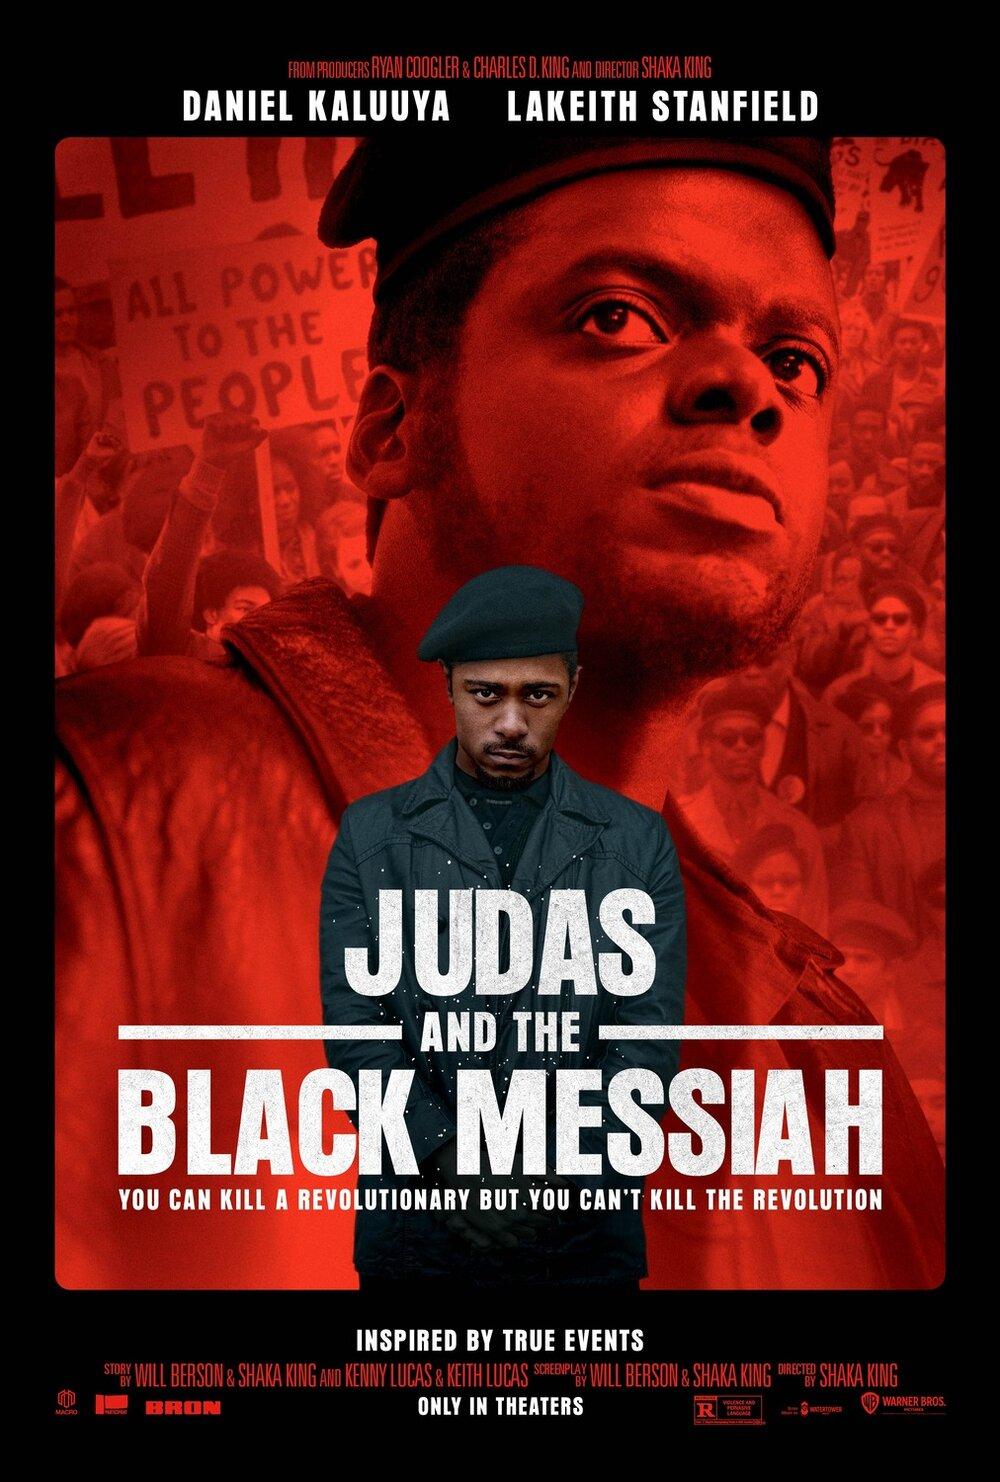 judas_and_the_black_messiah_xlg.jpg